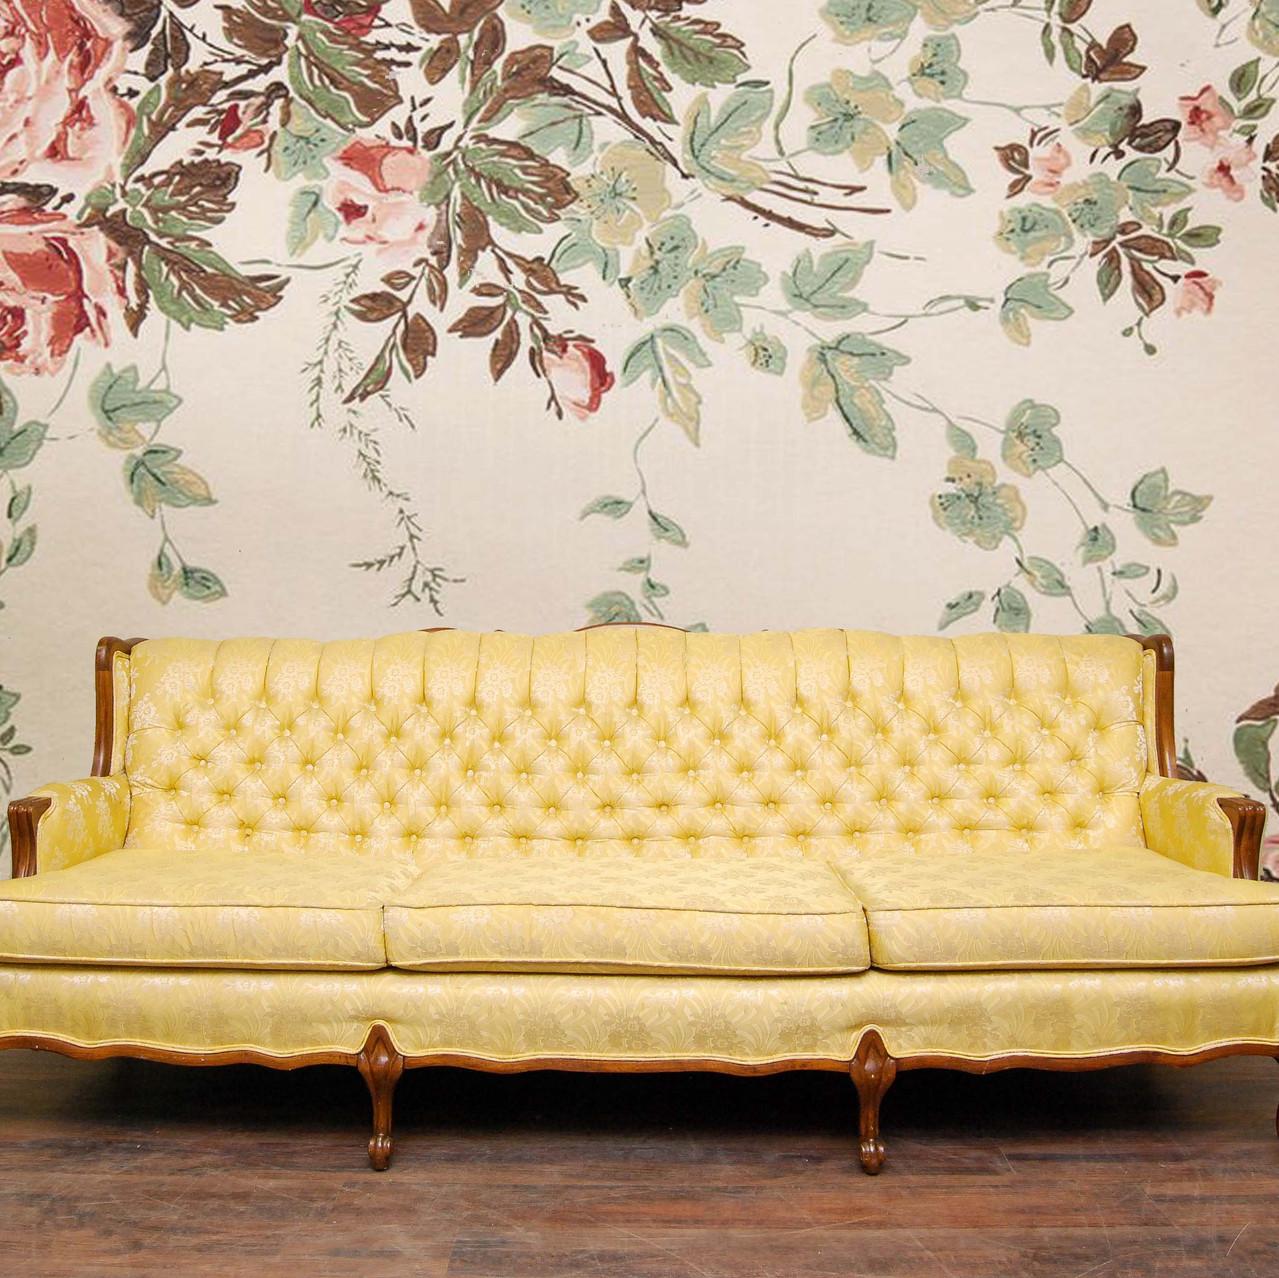 Yellow vintage sofa - before